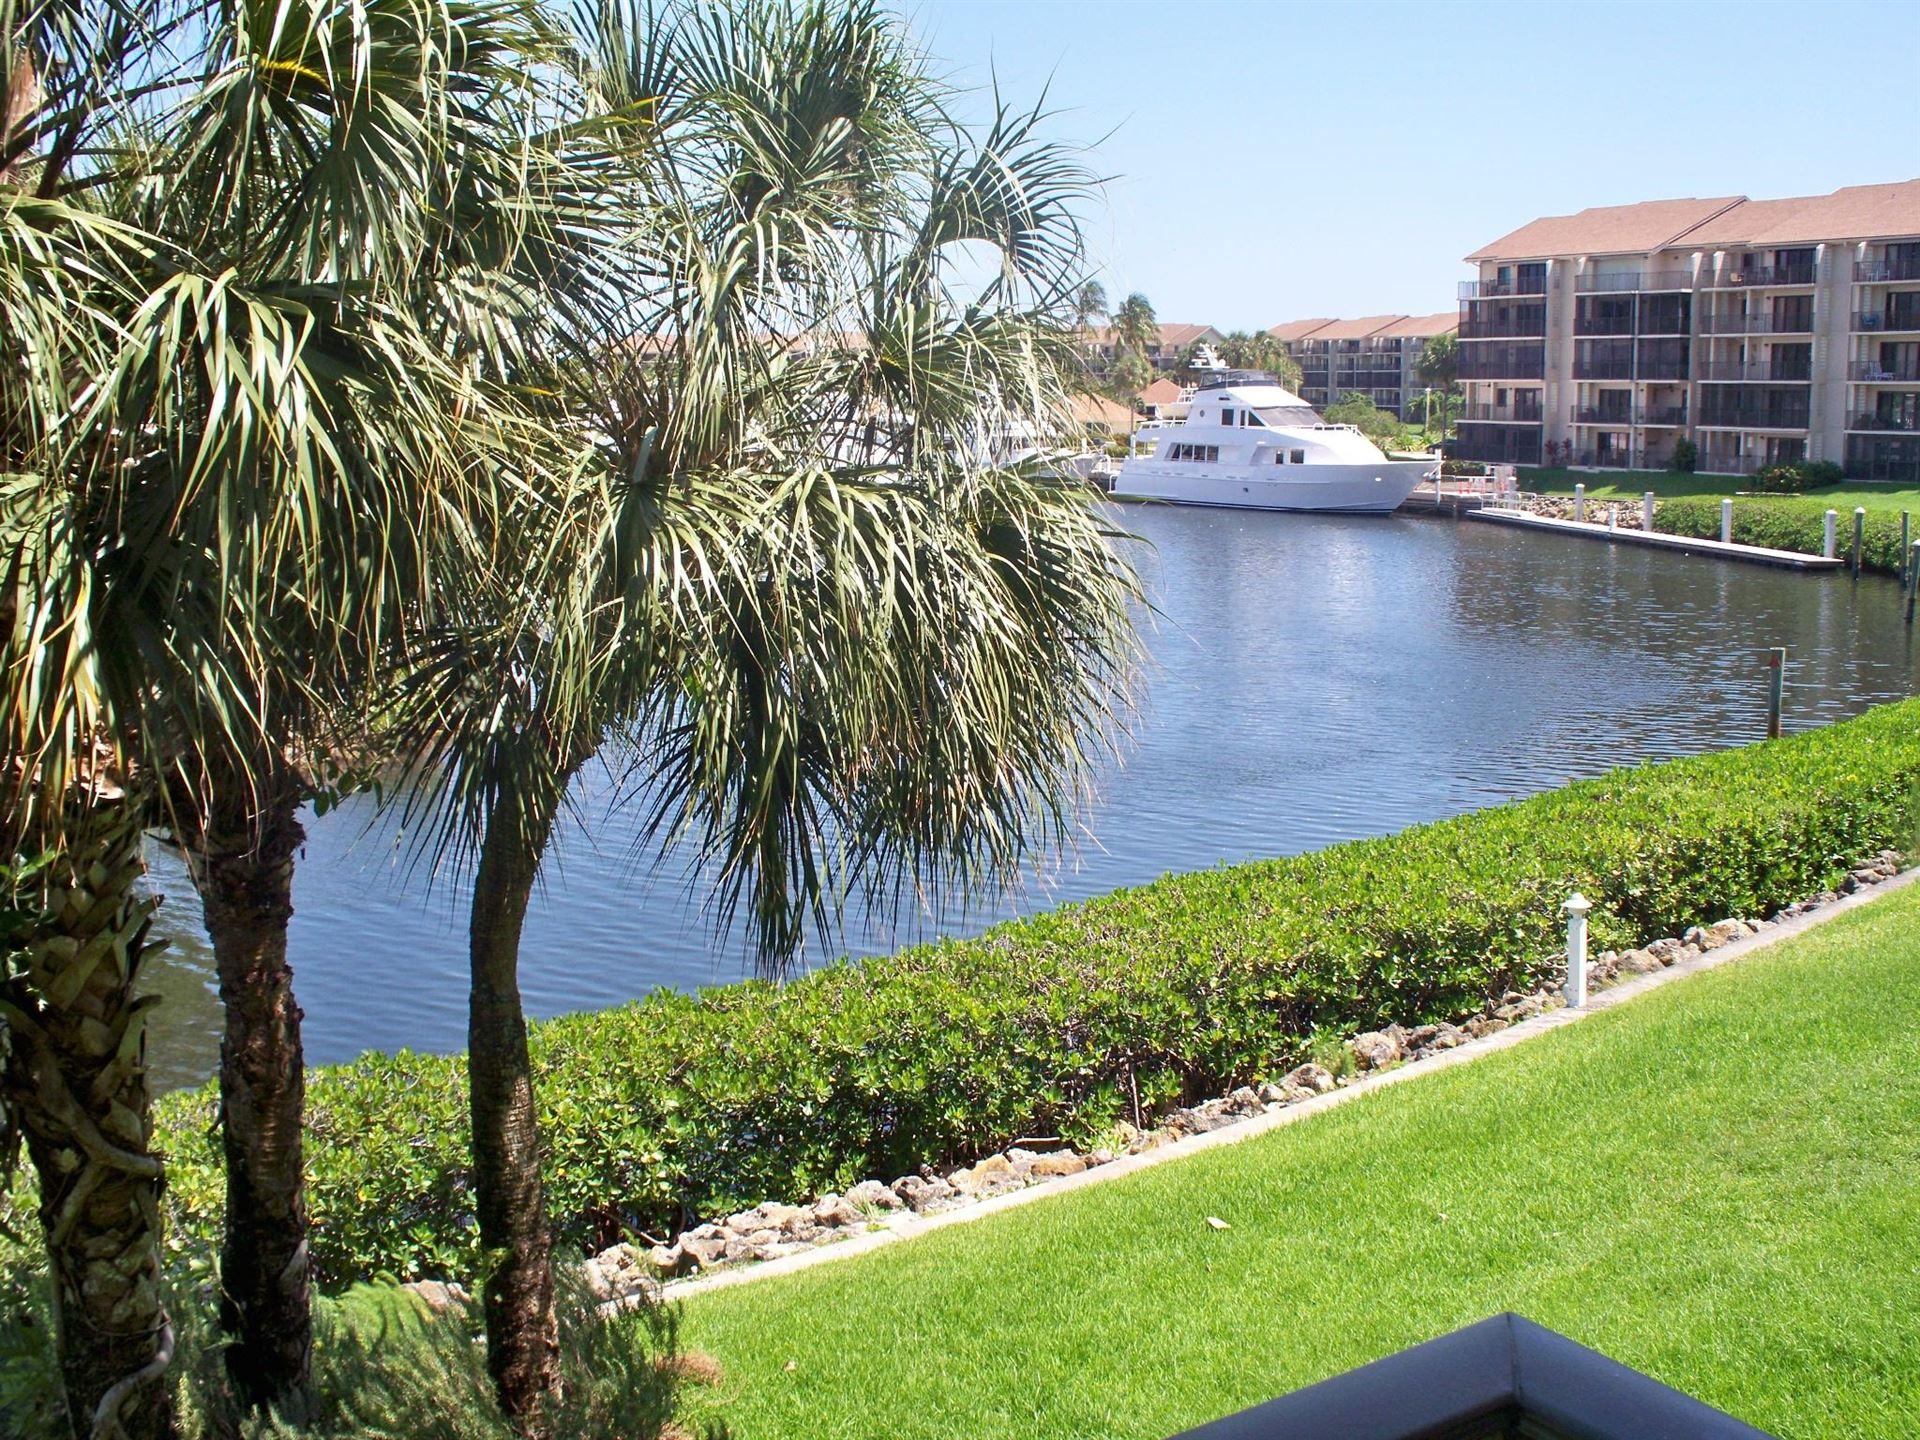 Photo of 1101 Seafarer Circle #201, Jupiter, FL 33477 (MLS # RX-10622151)